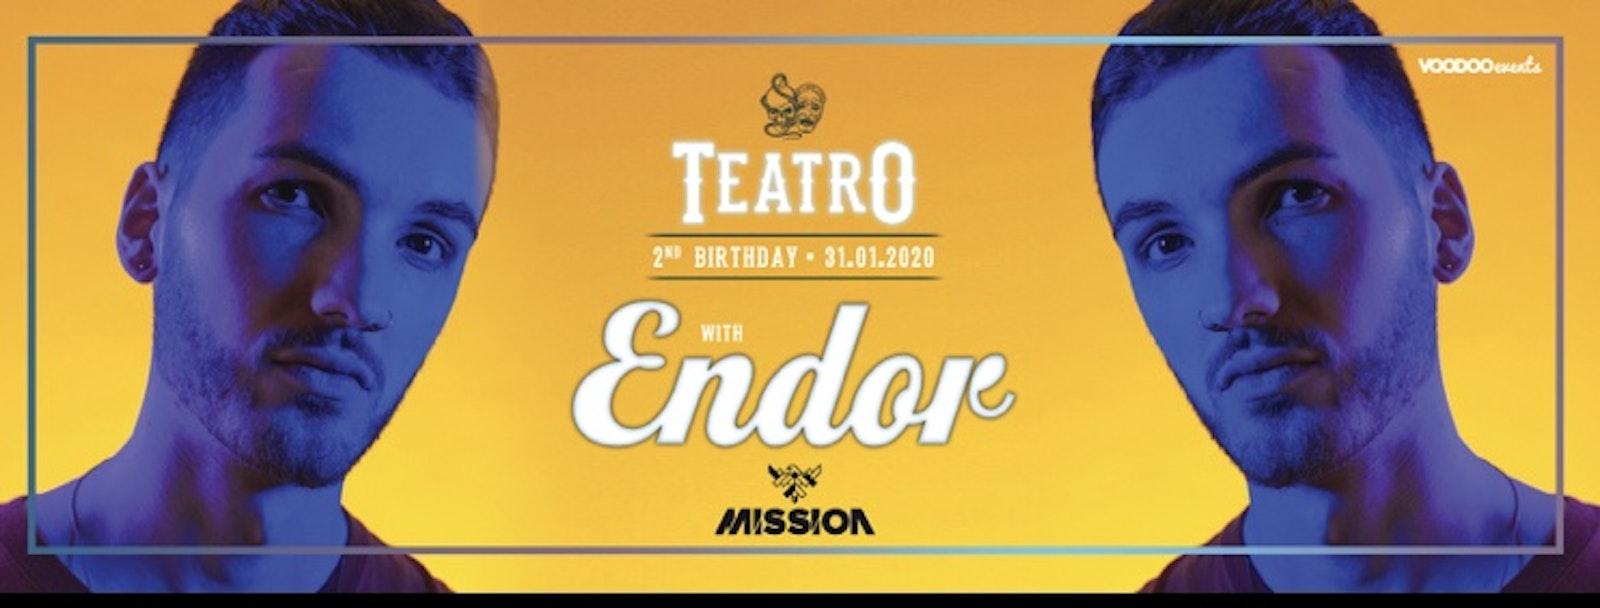 Teatro 2nd Birthday ENDOR